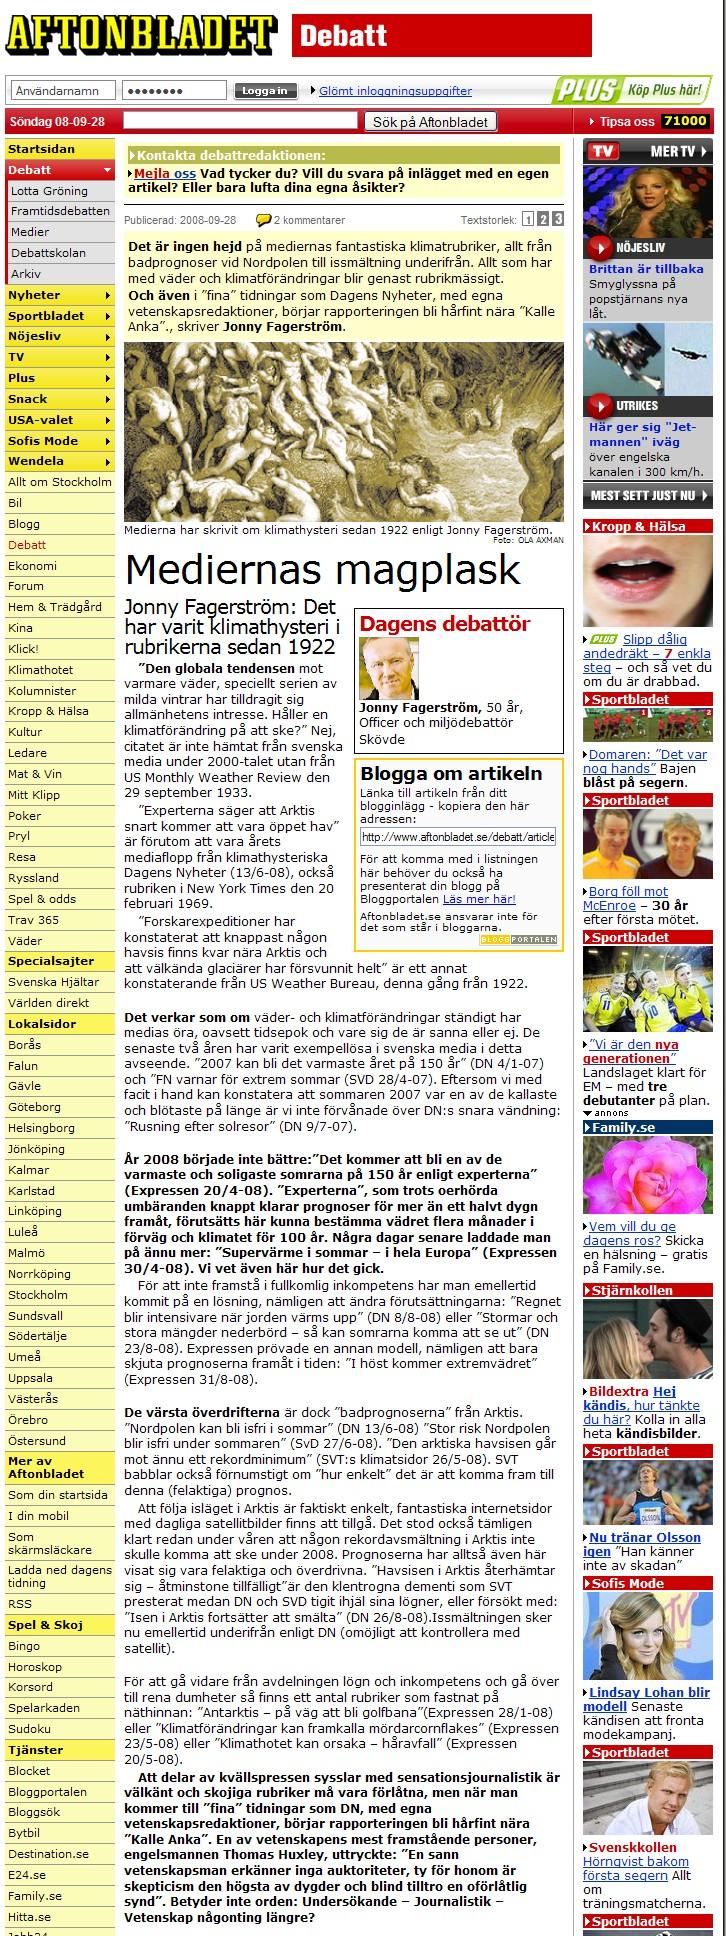 aftonbladet fagerstrom 28 sept